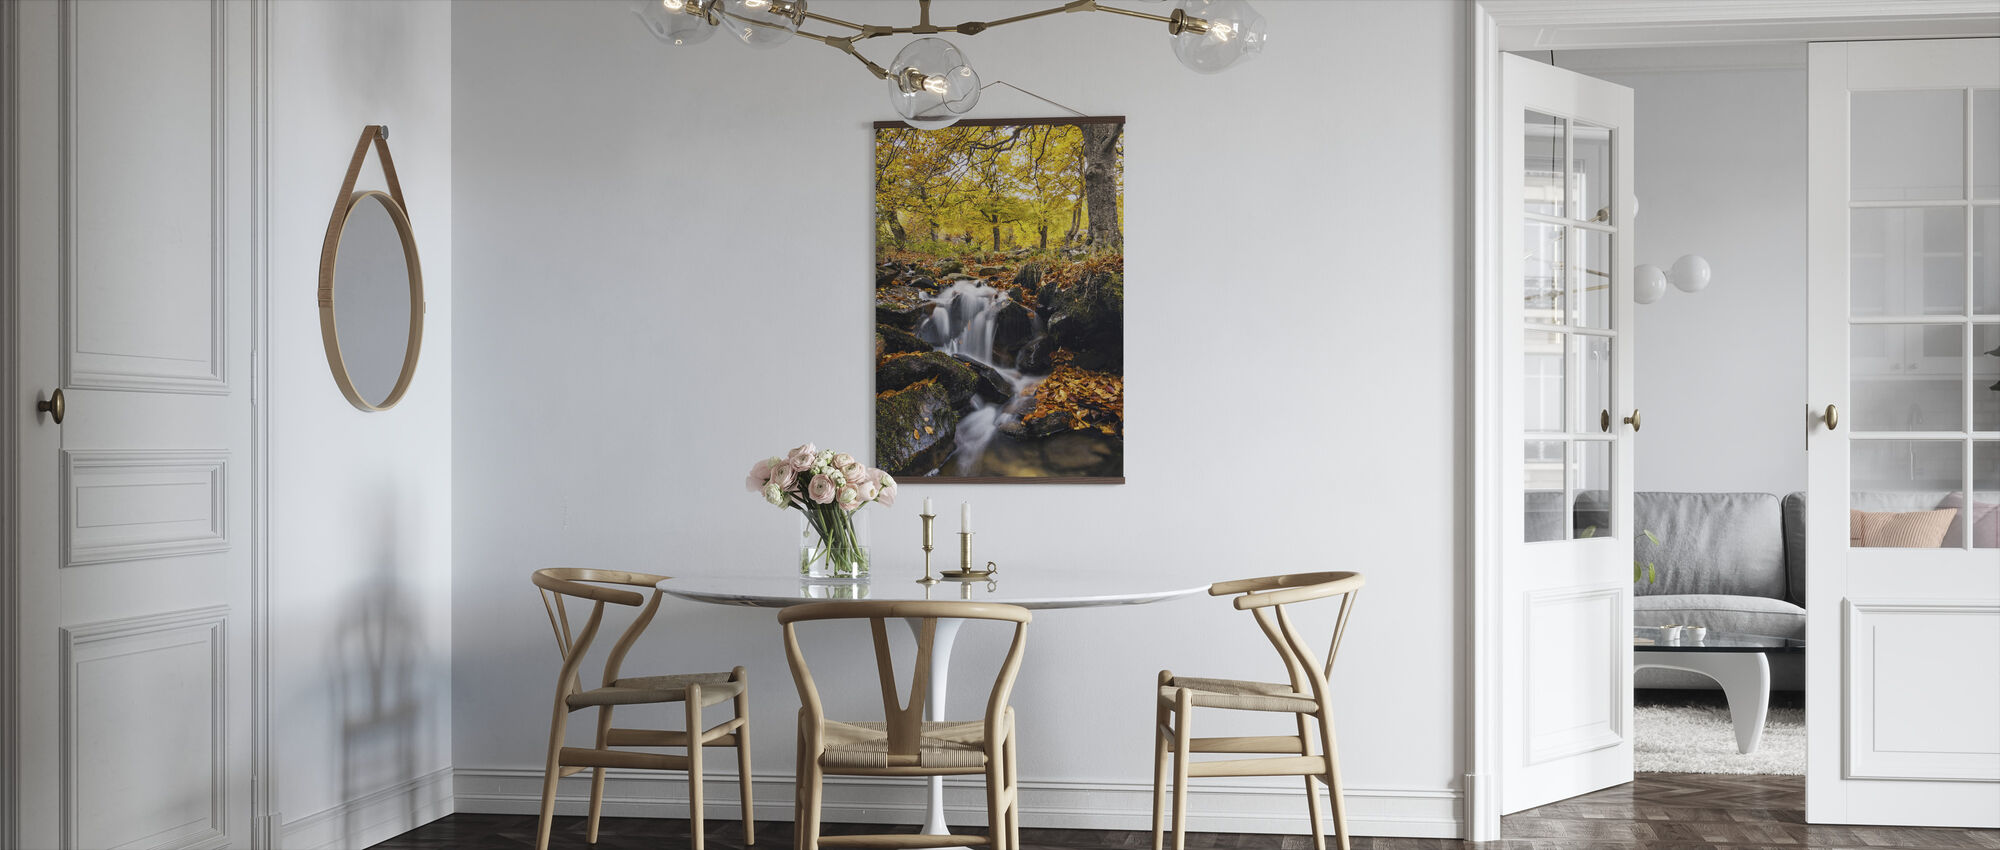 Splashes of Autumn - Poster - Kitchen